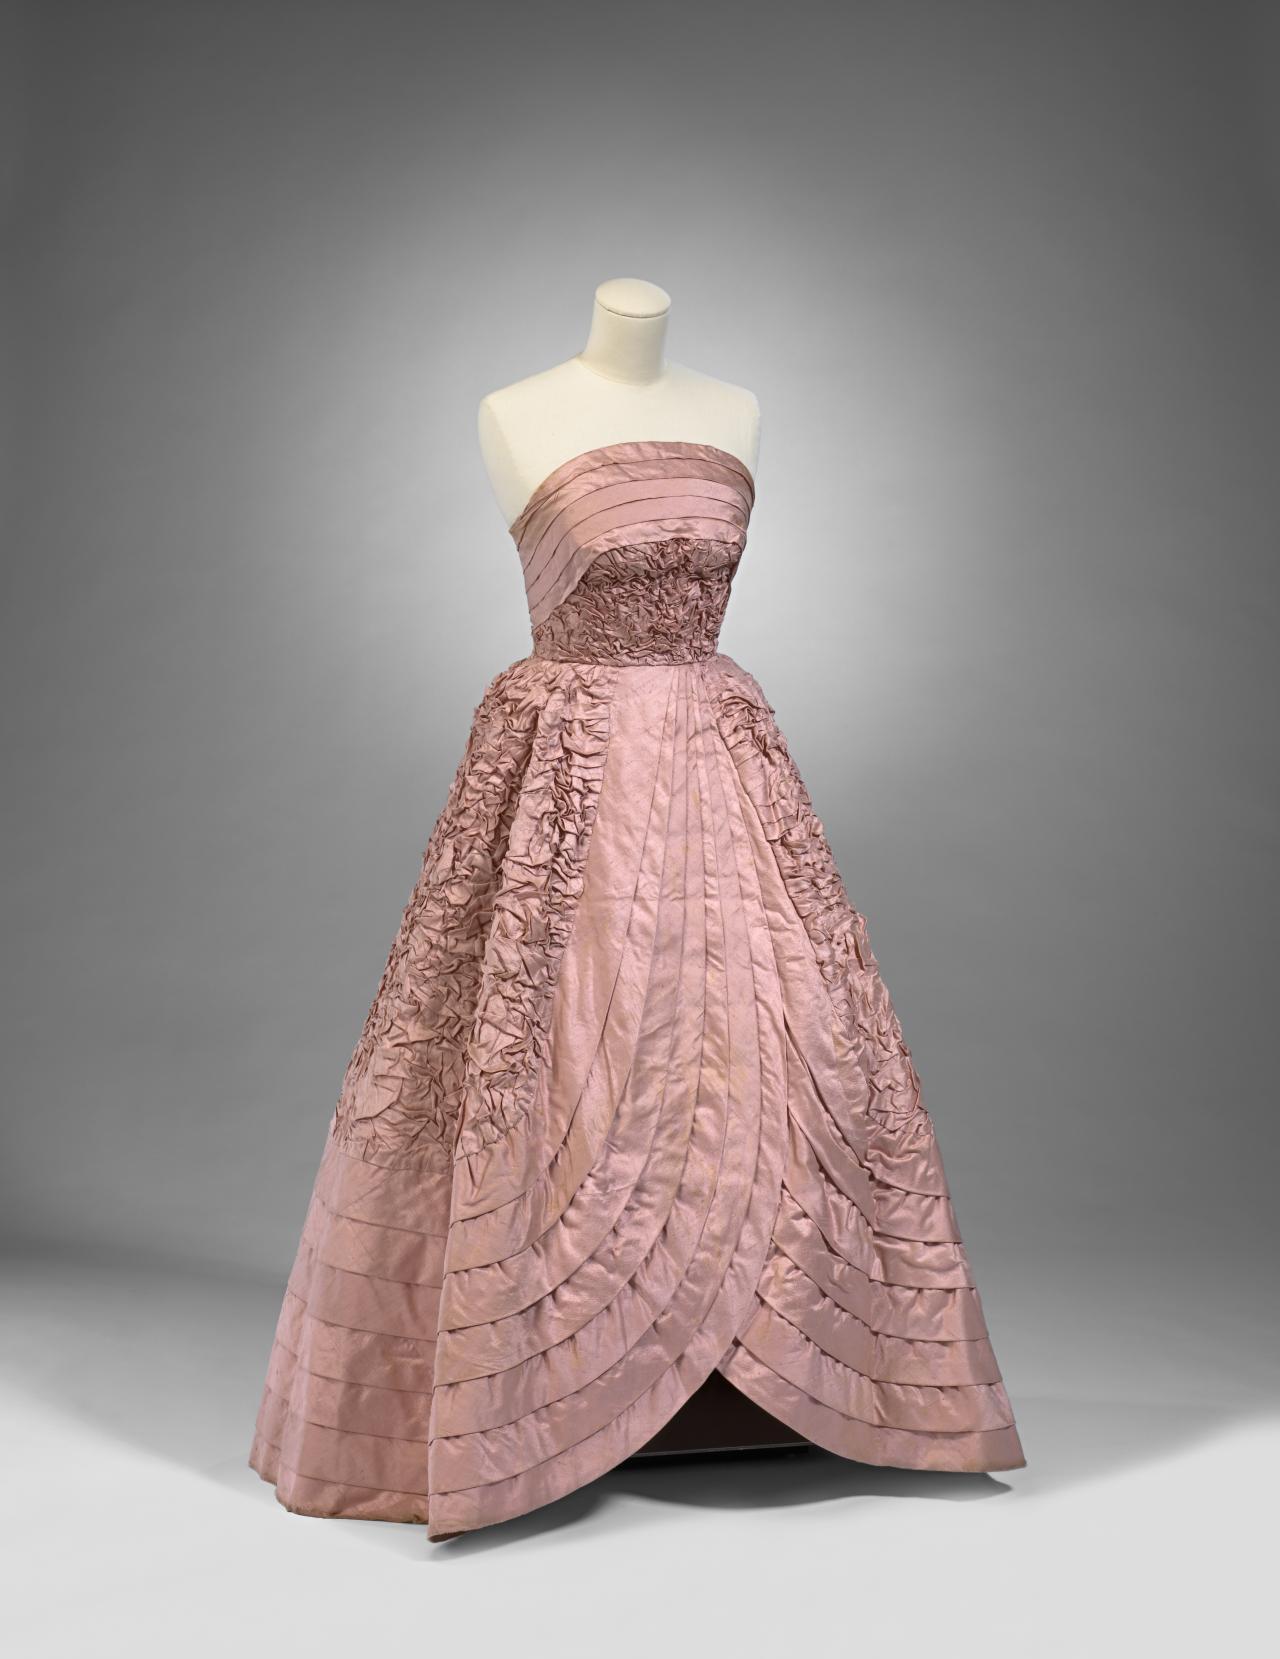 Evening gown   Hall LUDLOW (designer); HALL LUDLOW, Melbourne ...